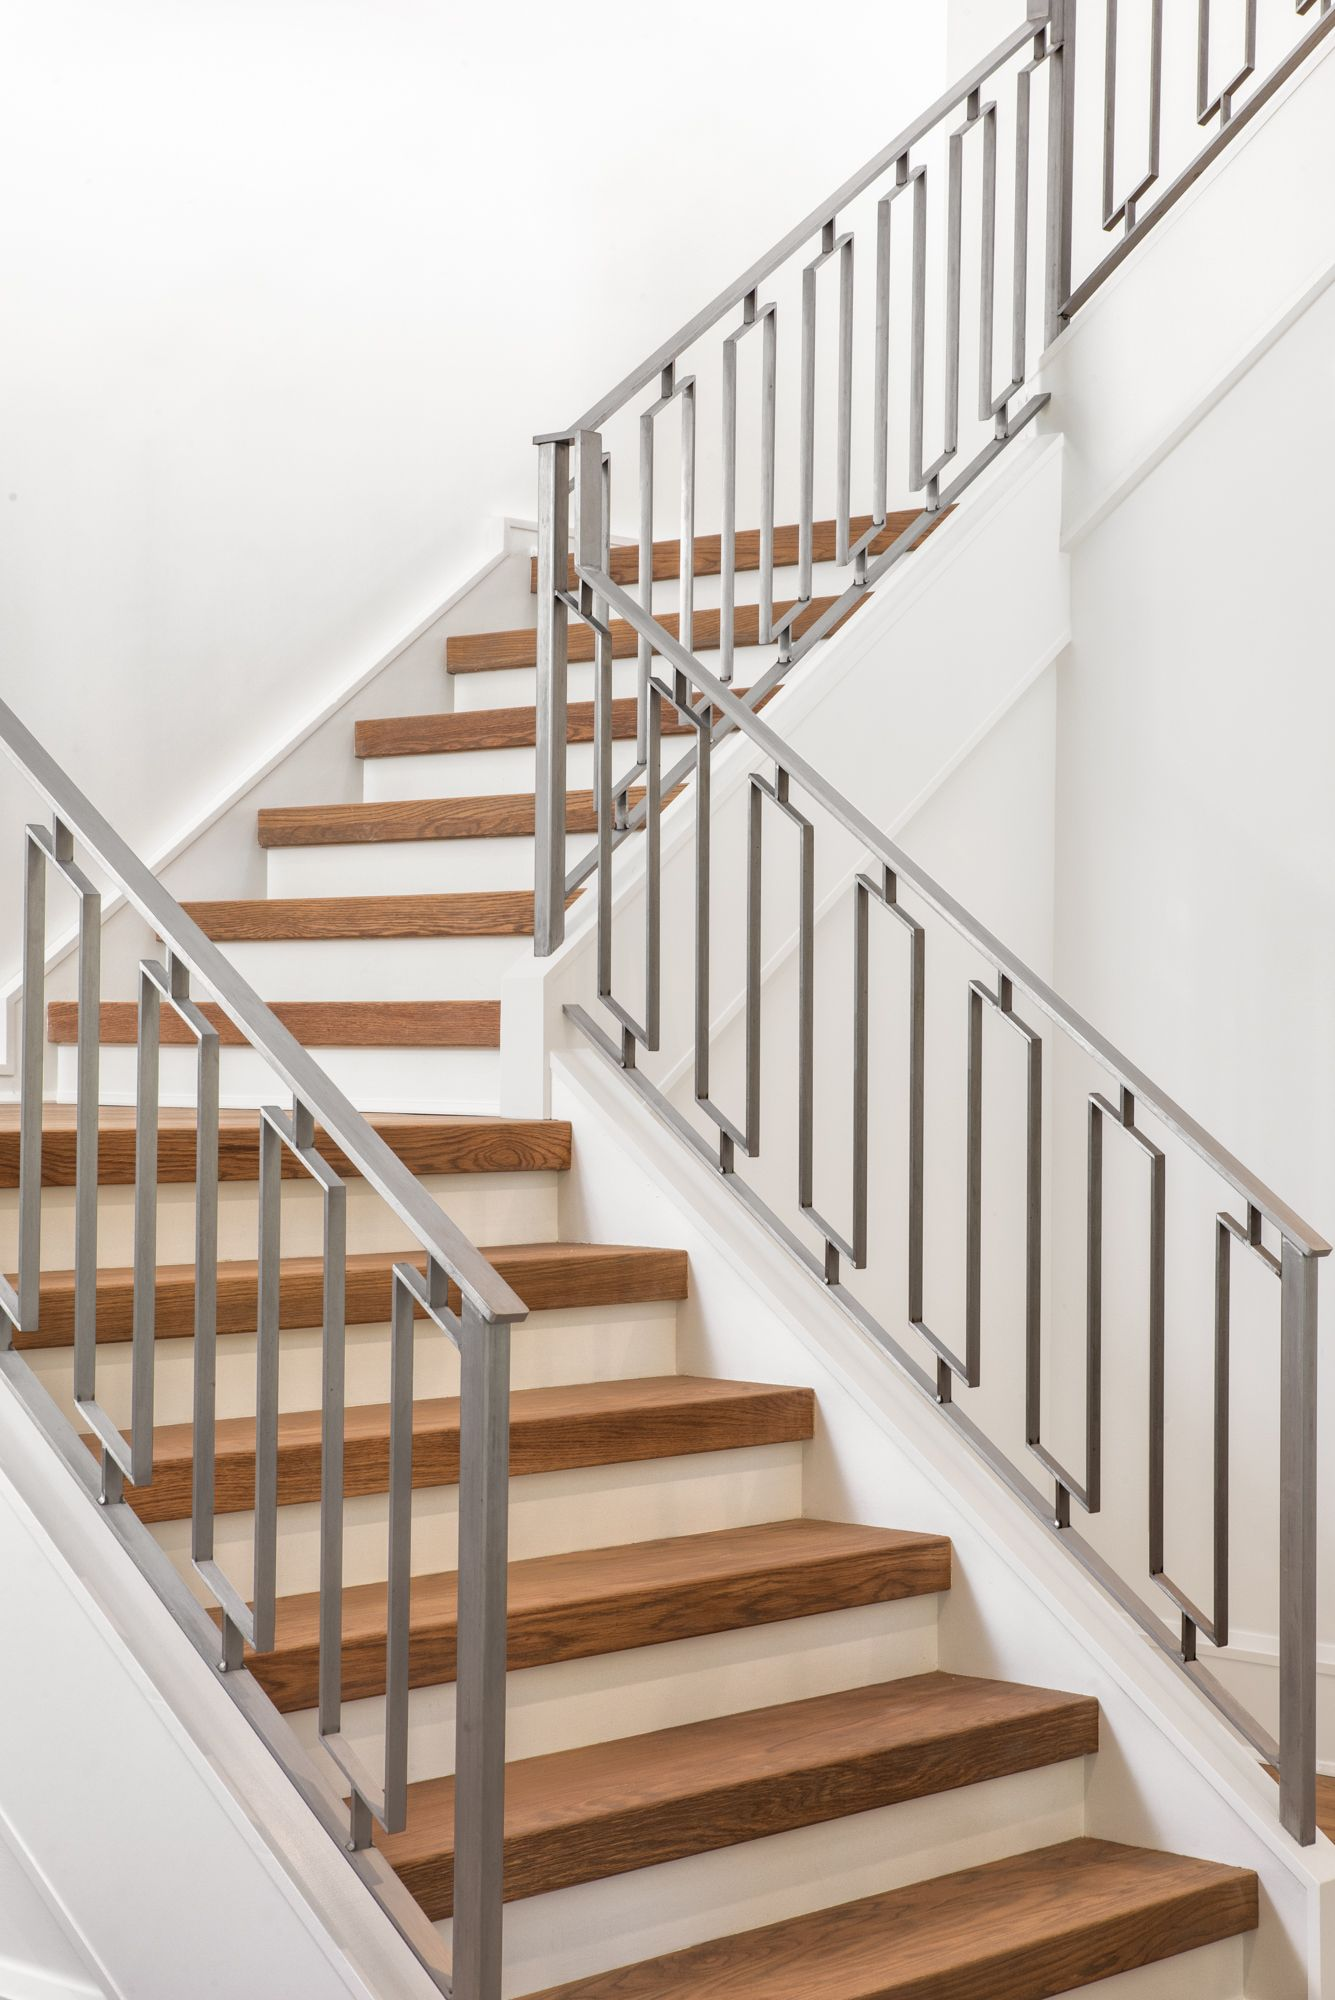 Chiott Custom Homes   custom stair rail   Stair railing ...